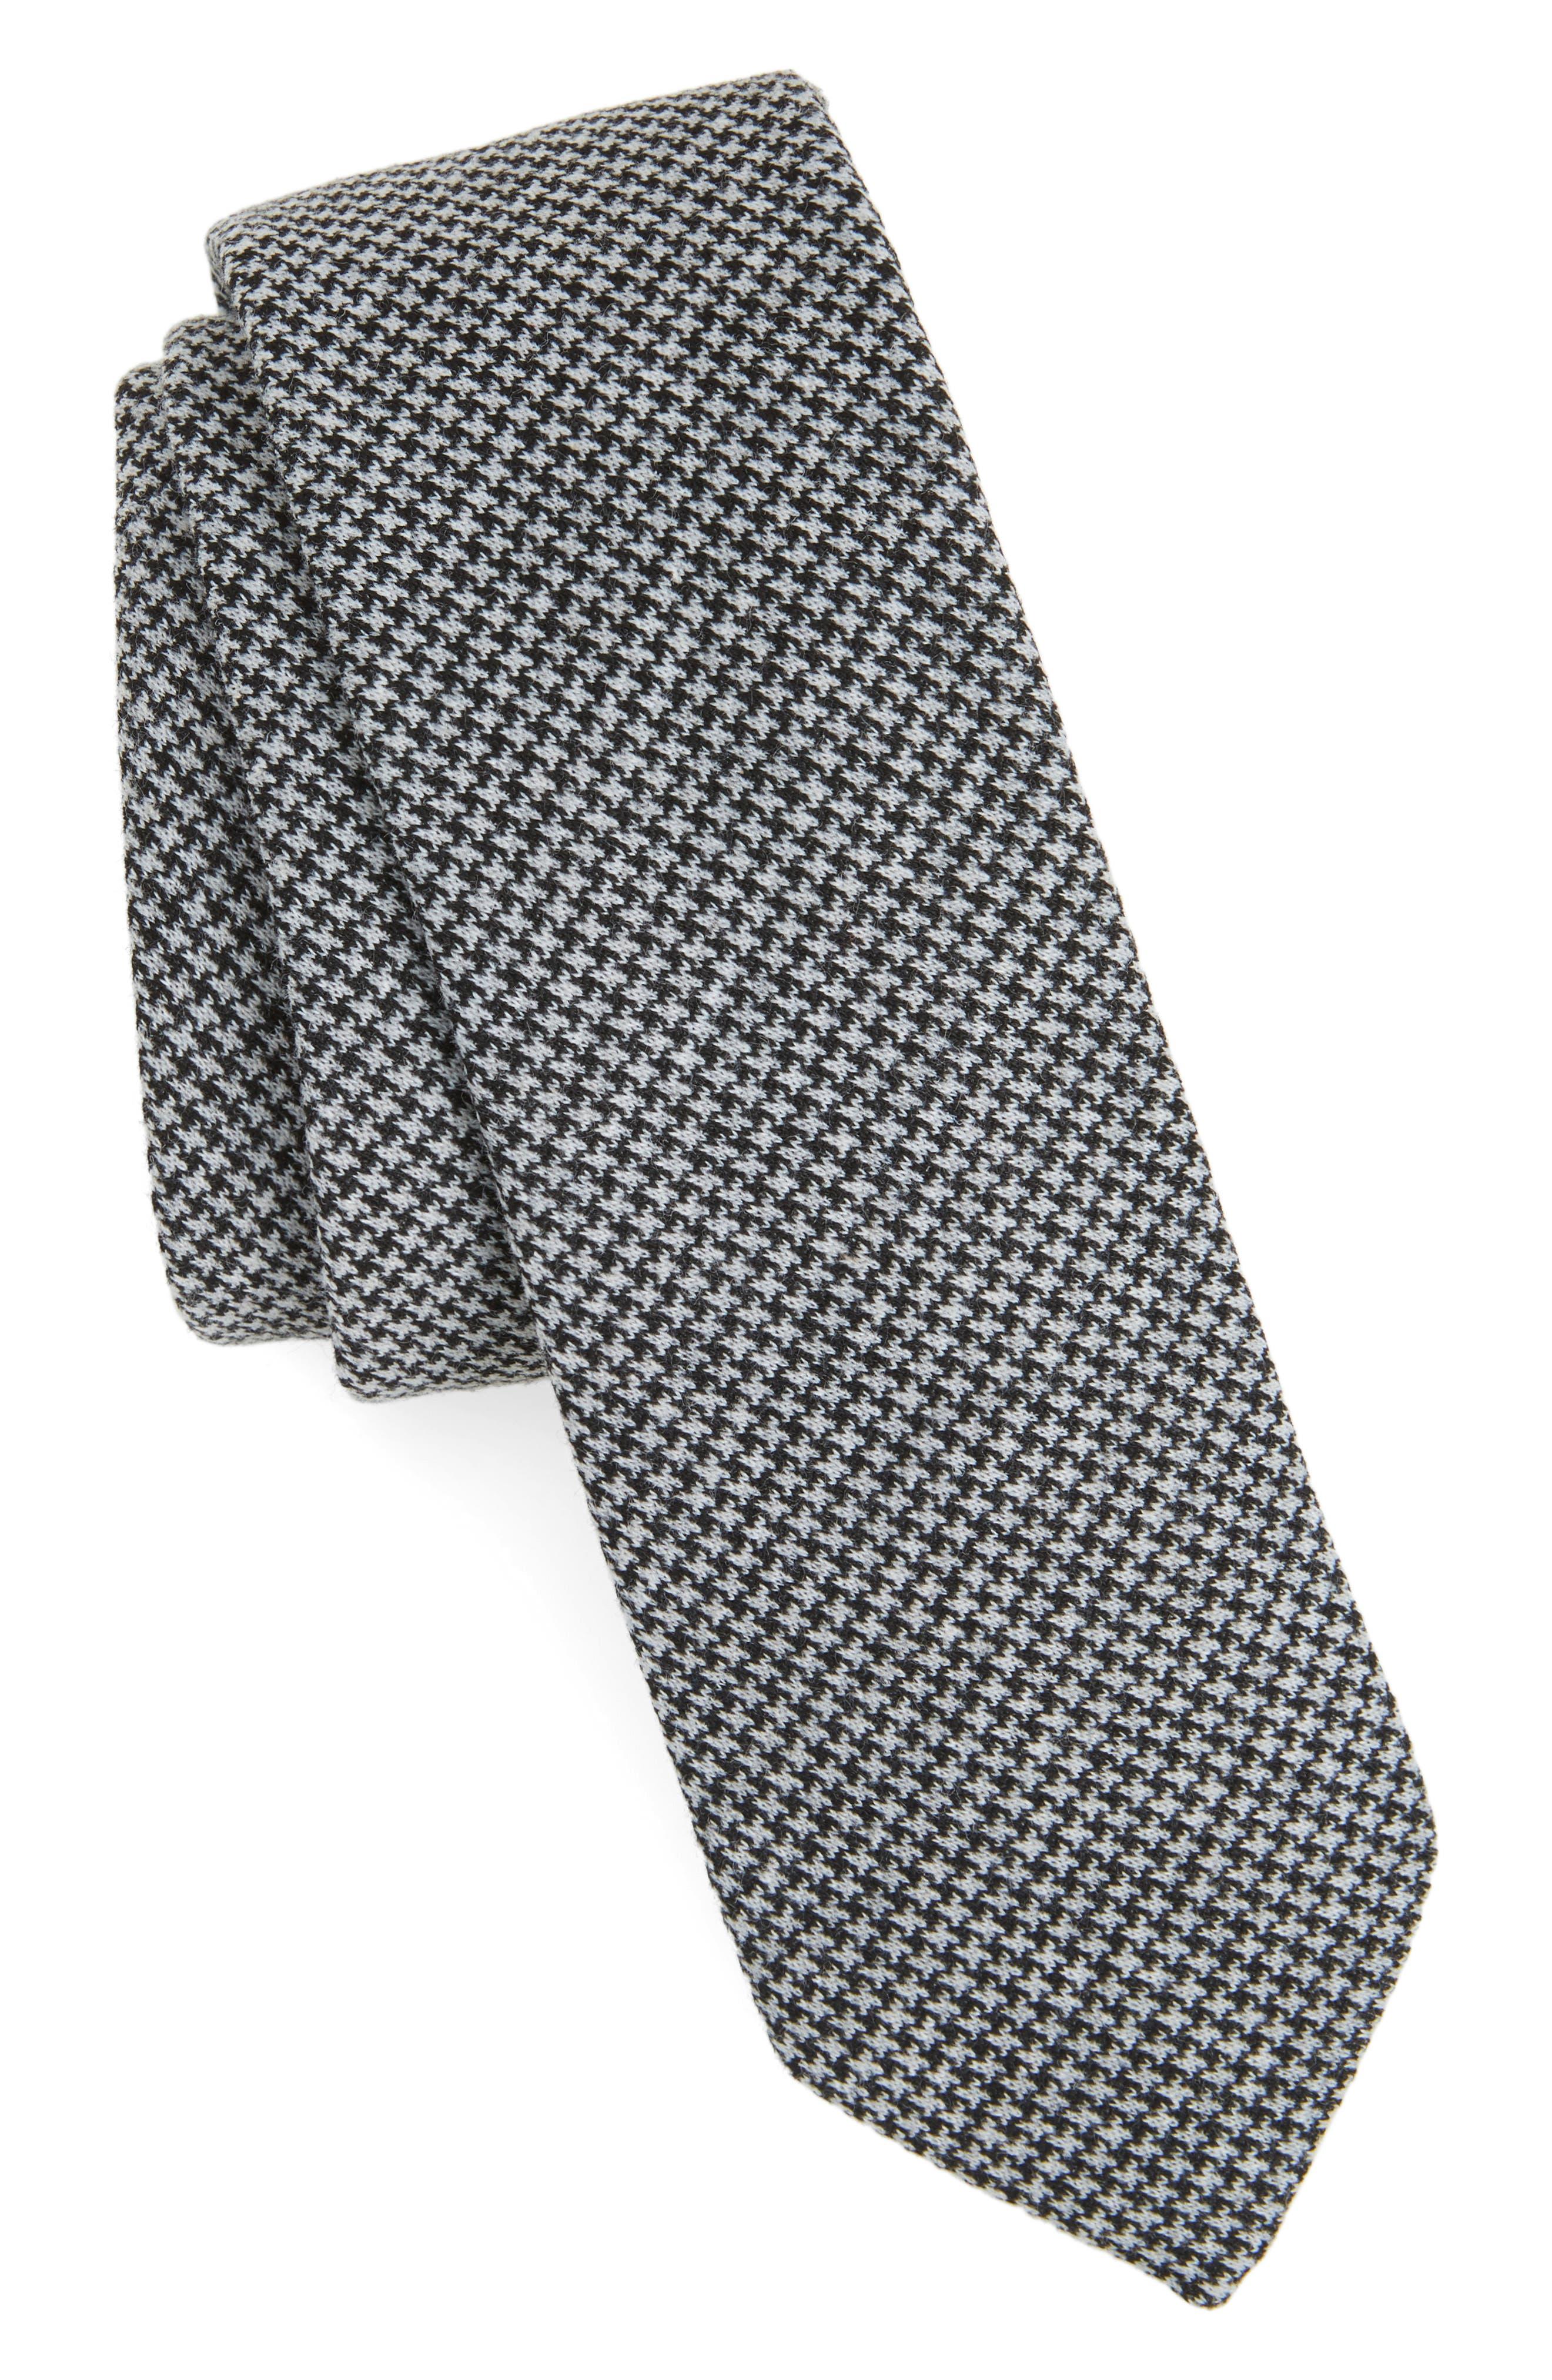 Main Image - 1901 Walton Houndstooth Skinny Tie